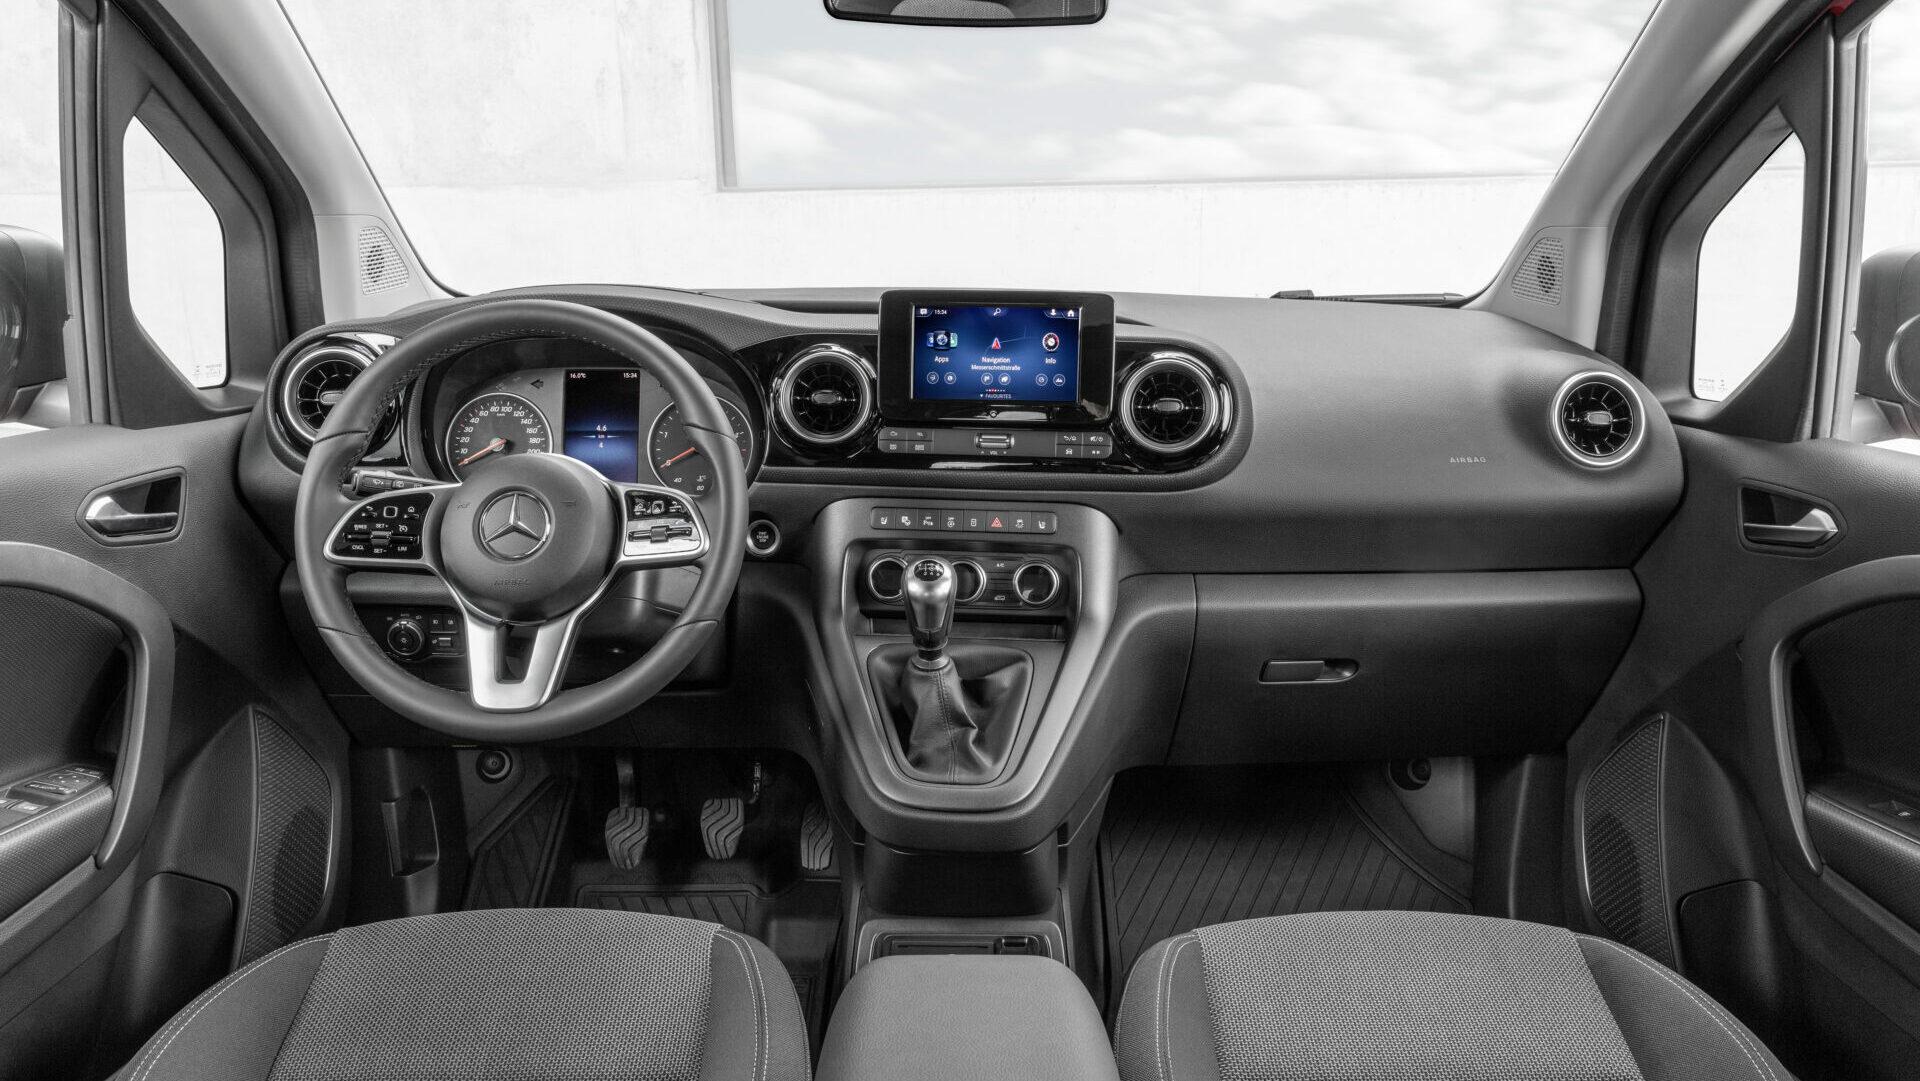 Mercedes-Benz Citan Tourer 2022 interior